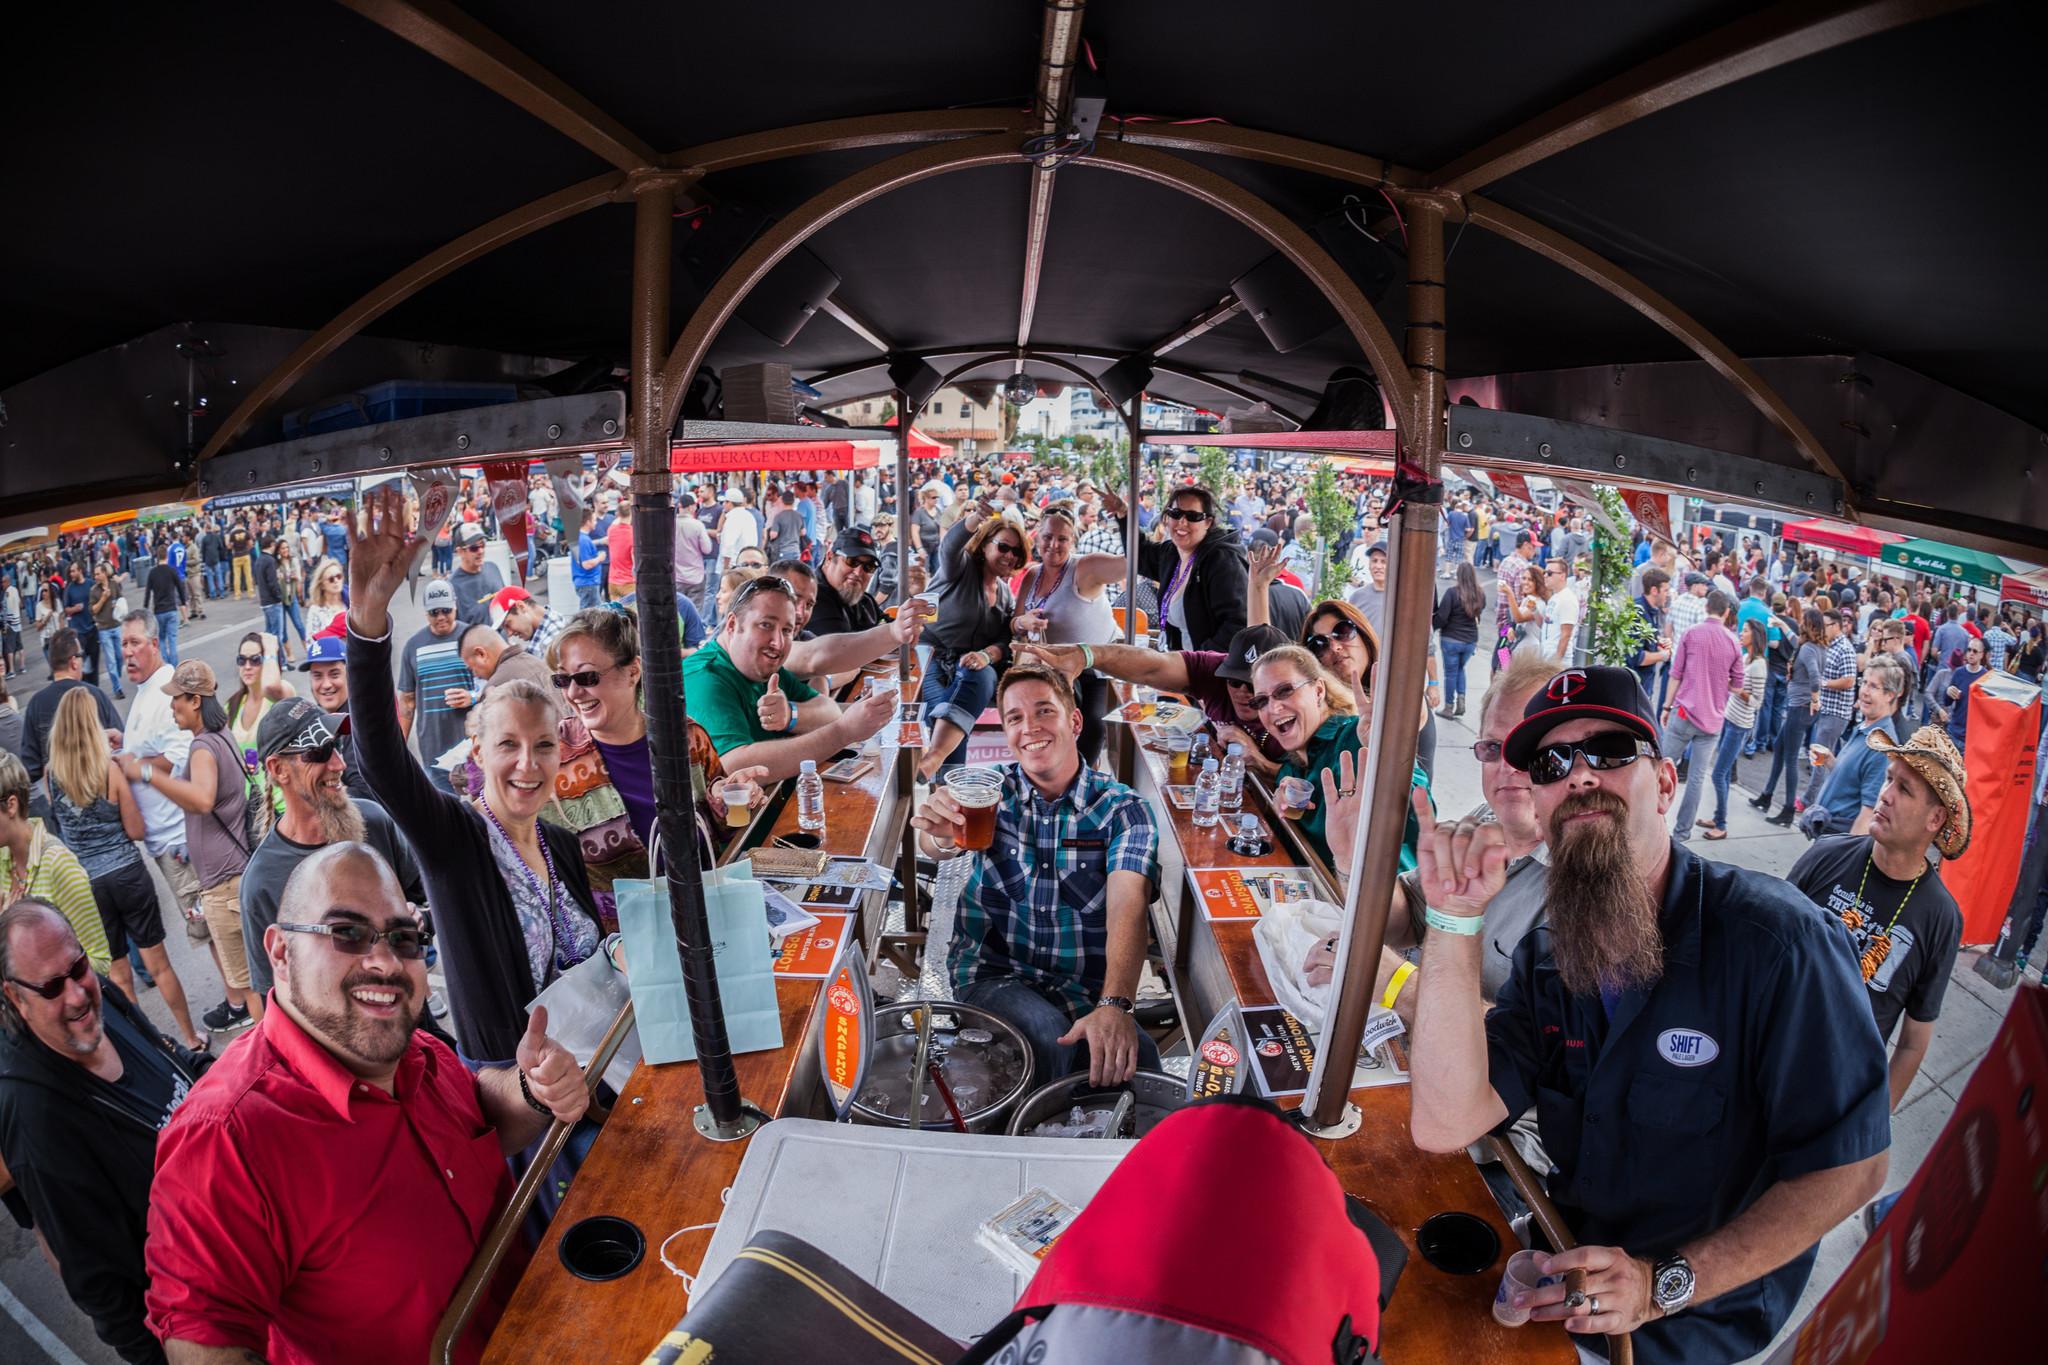 Two Las Vegas beer festivals focus on craft brews in April